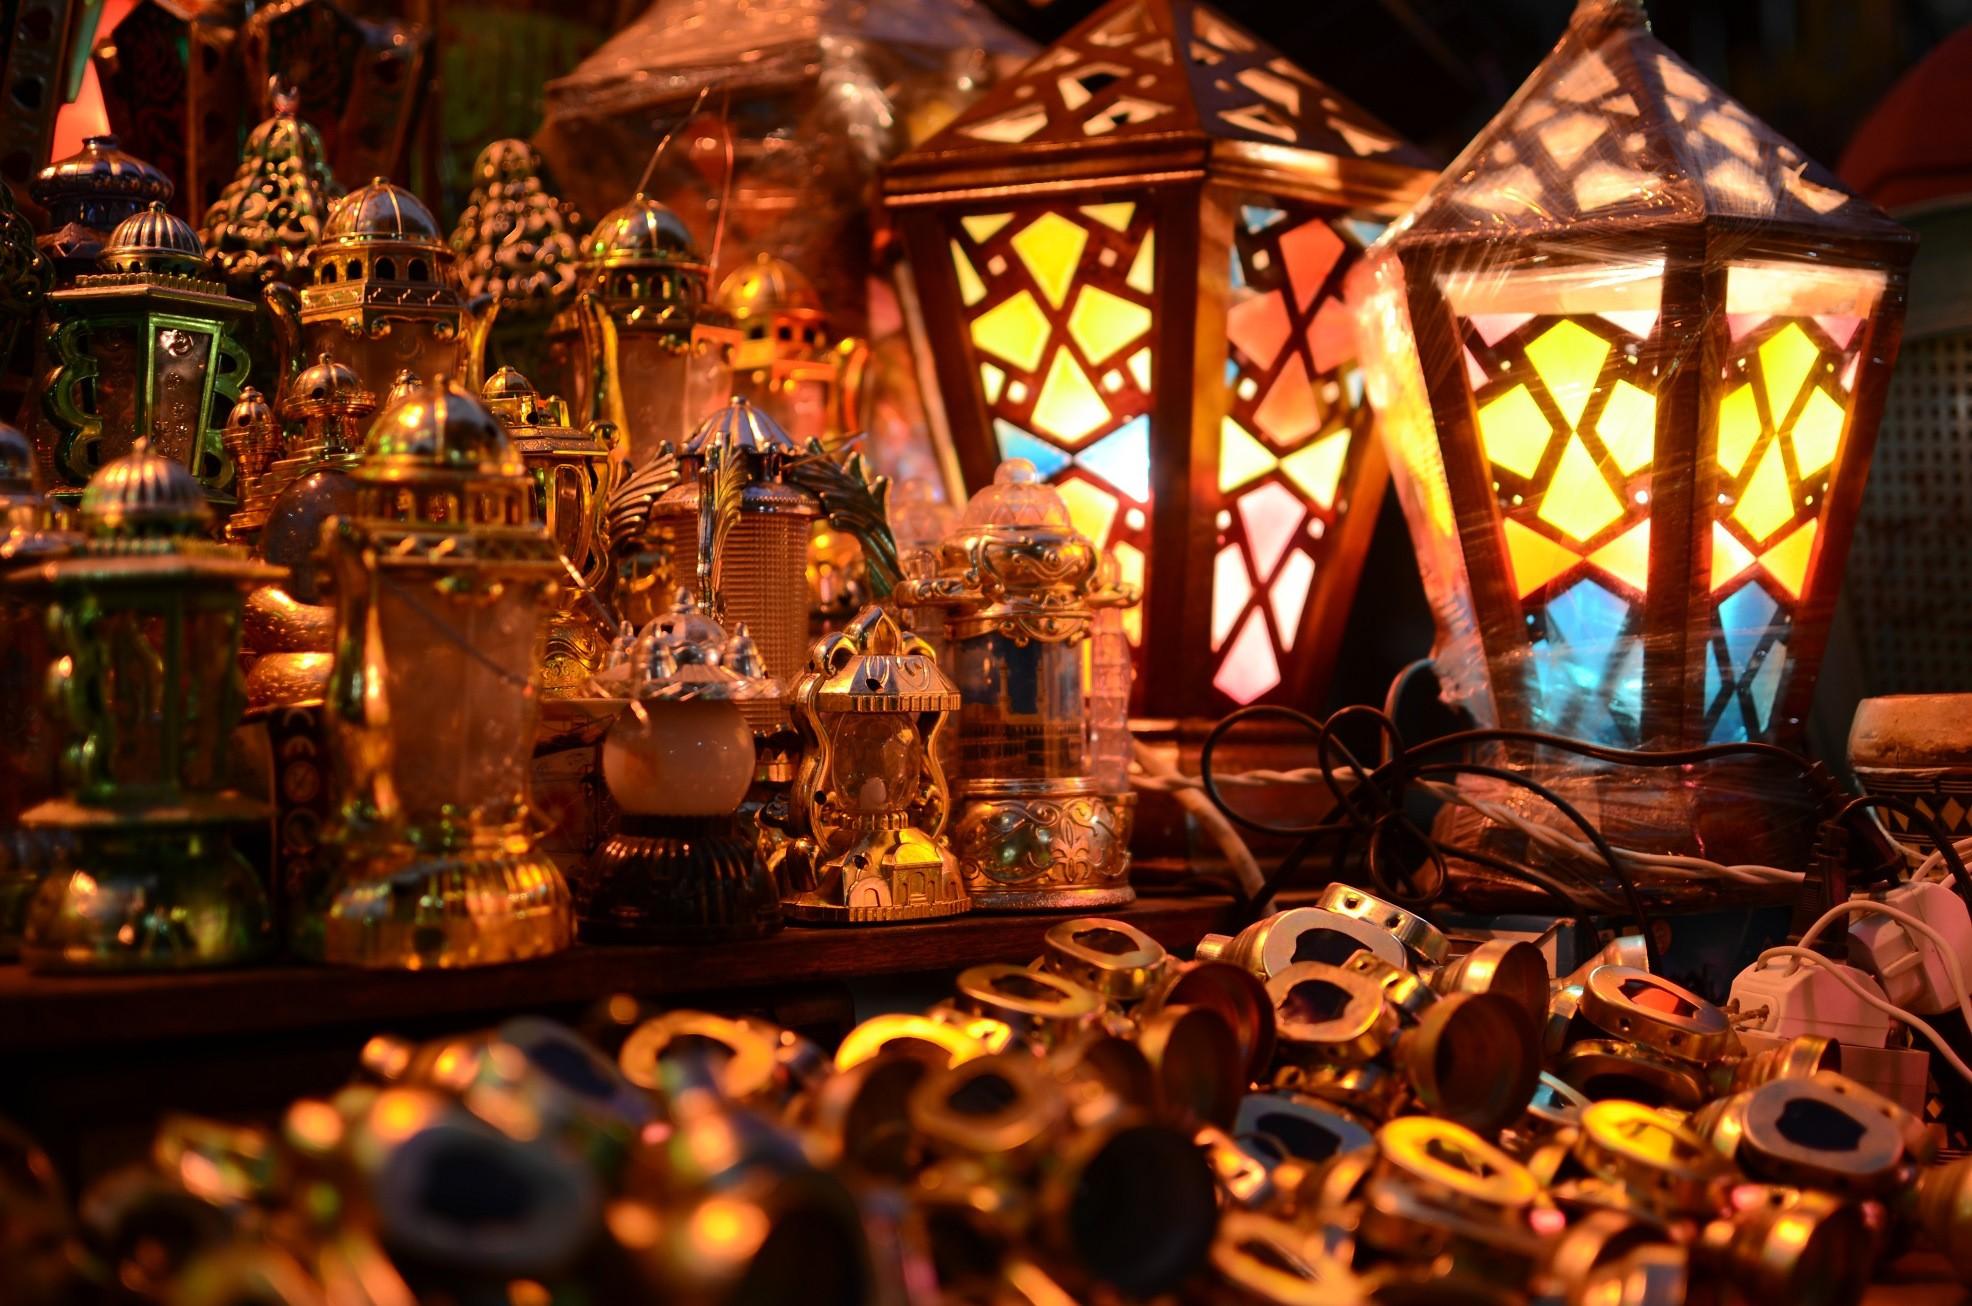 بالصور صور زينة رمضان , زينه شهر رمضان المبارك 4176 2